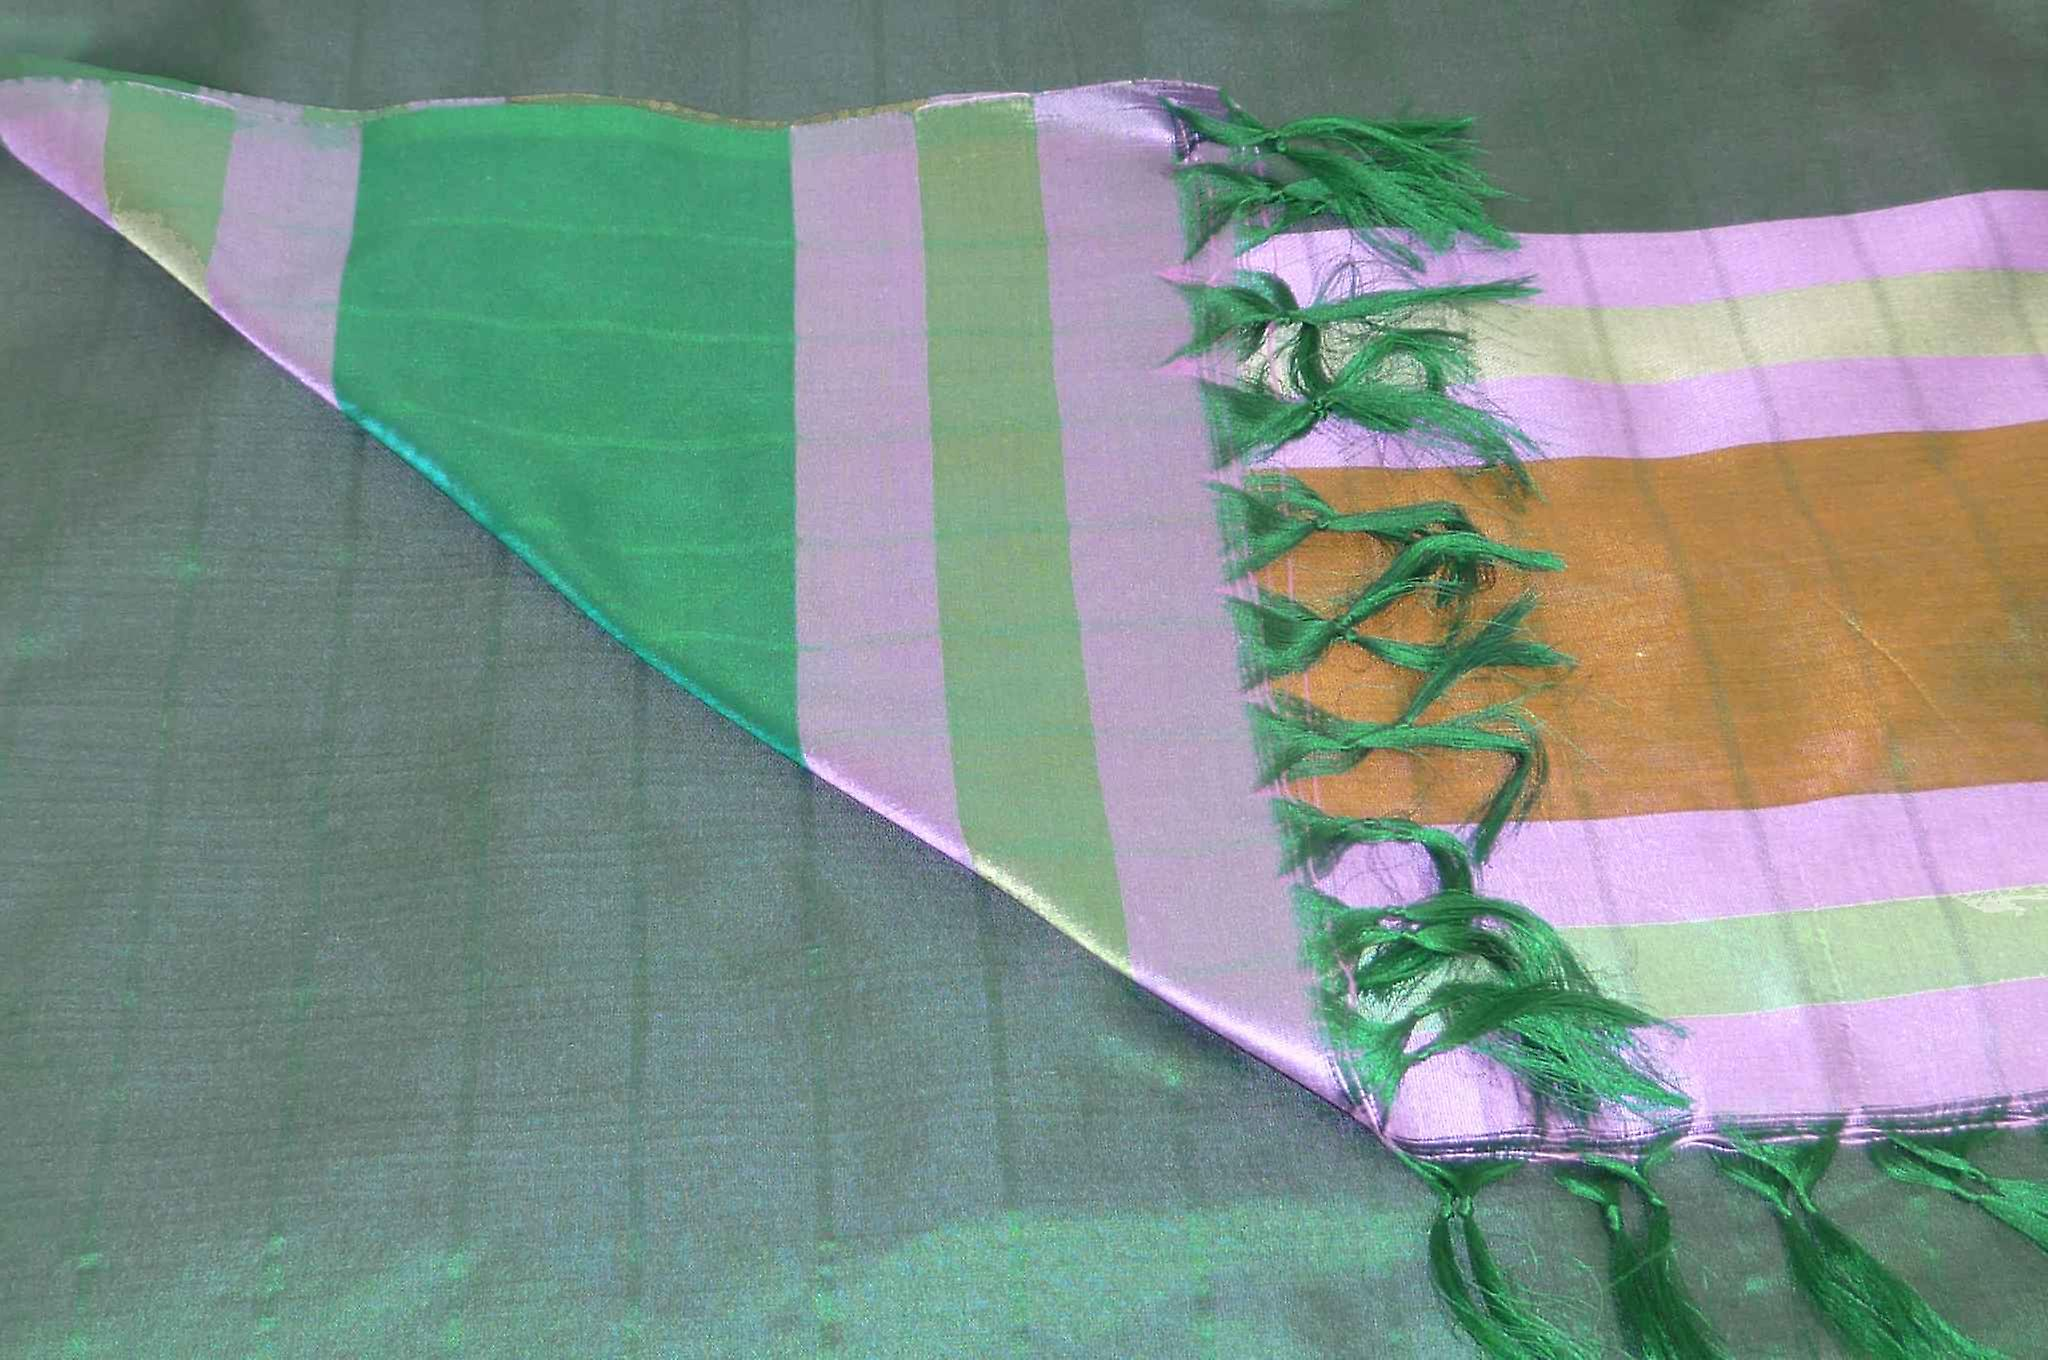 Varanasi Border Prime Silk Long Scarf Heritage Swami 602 by Pashmina & Silk